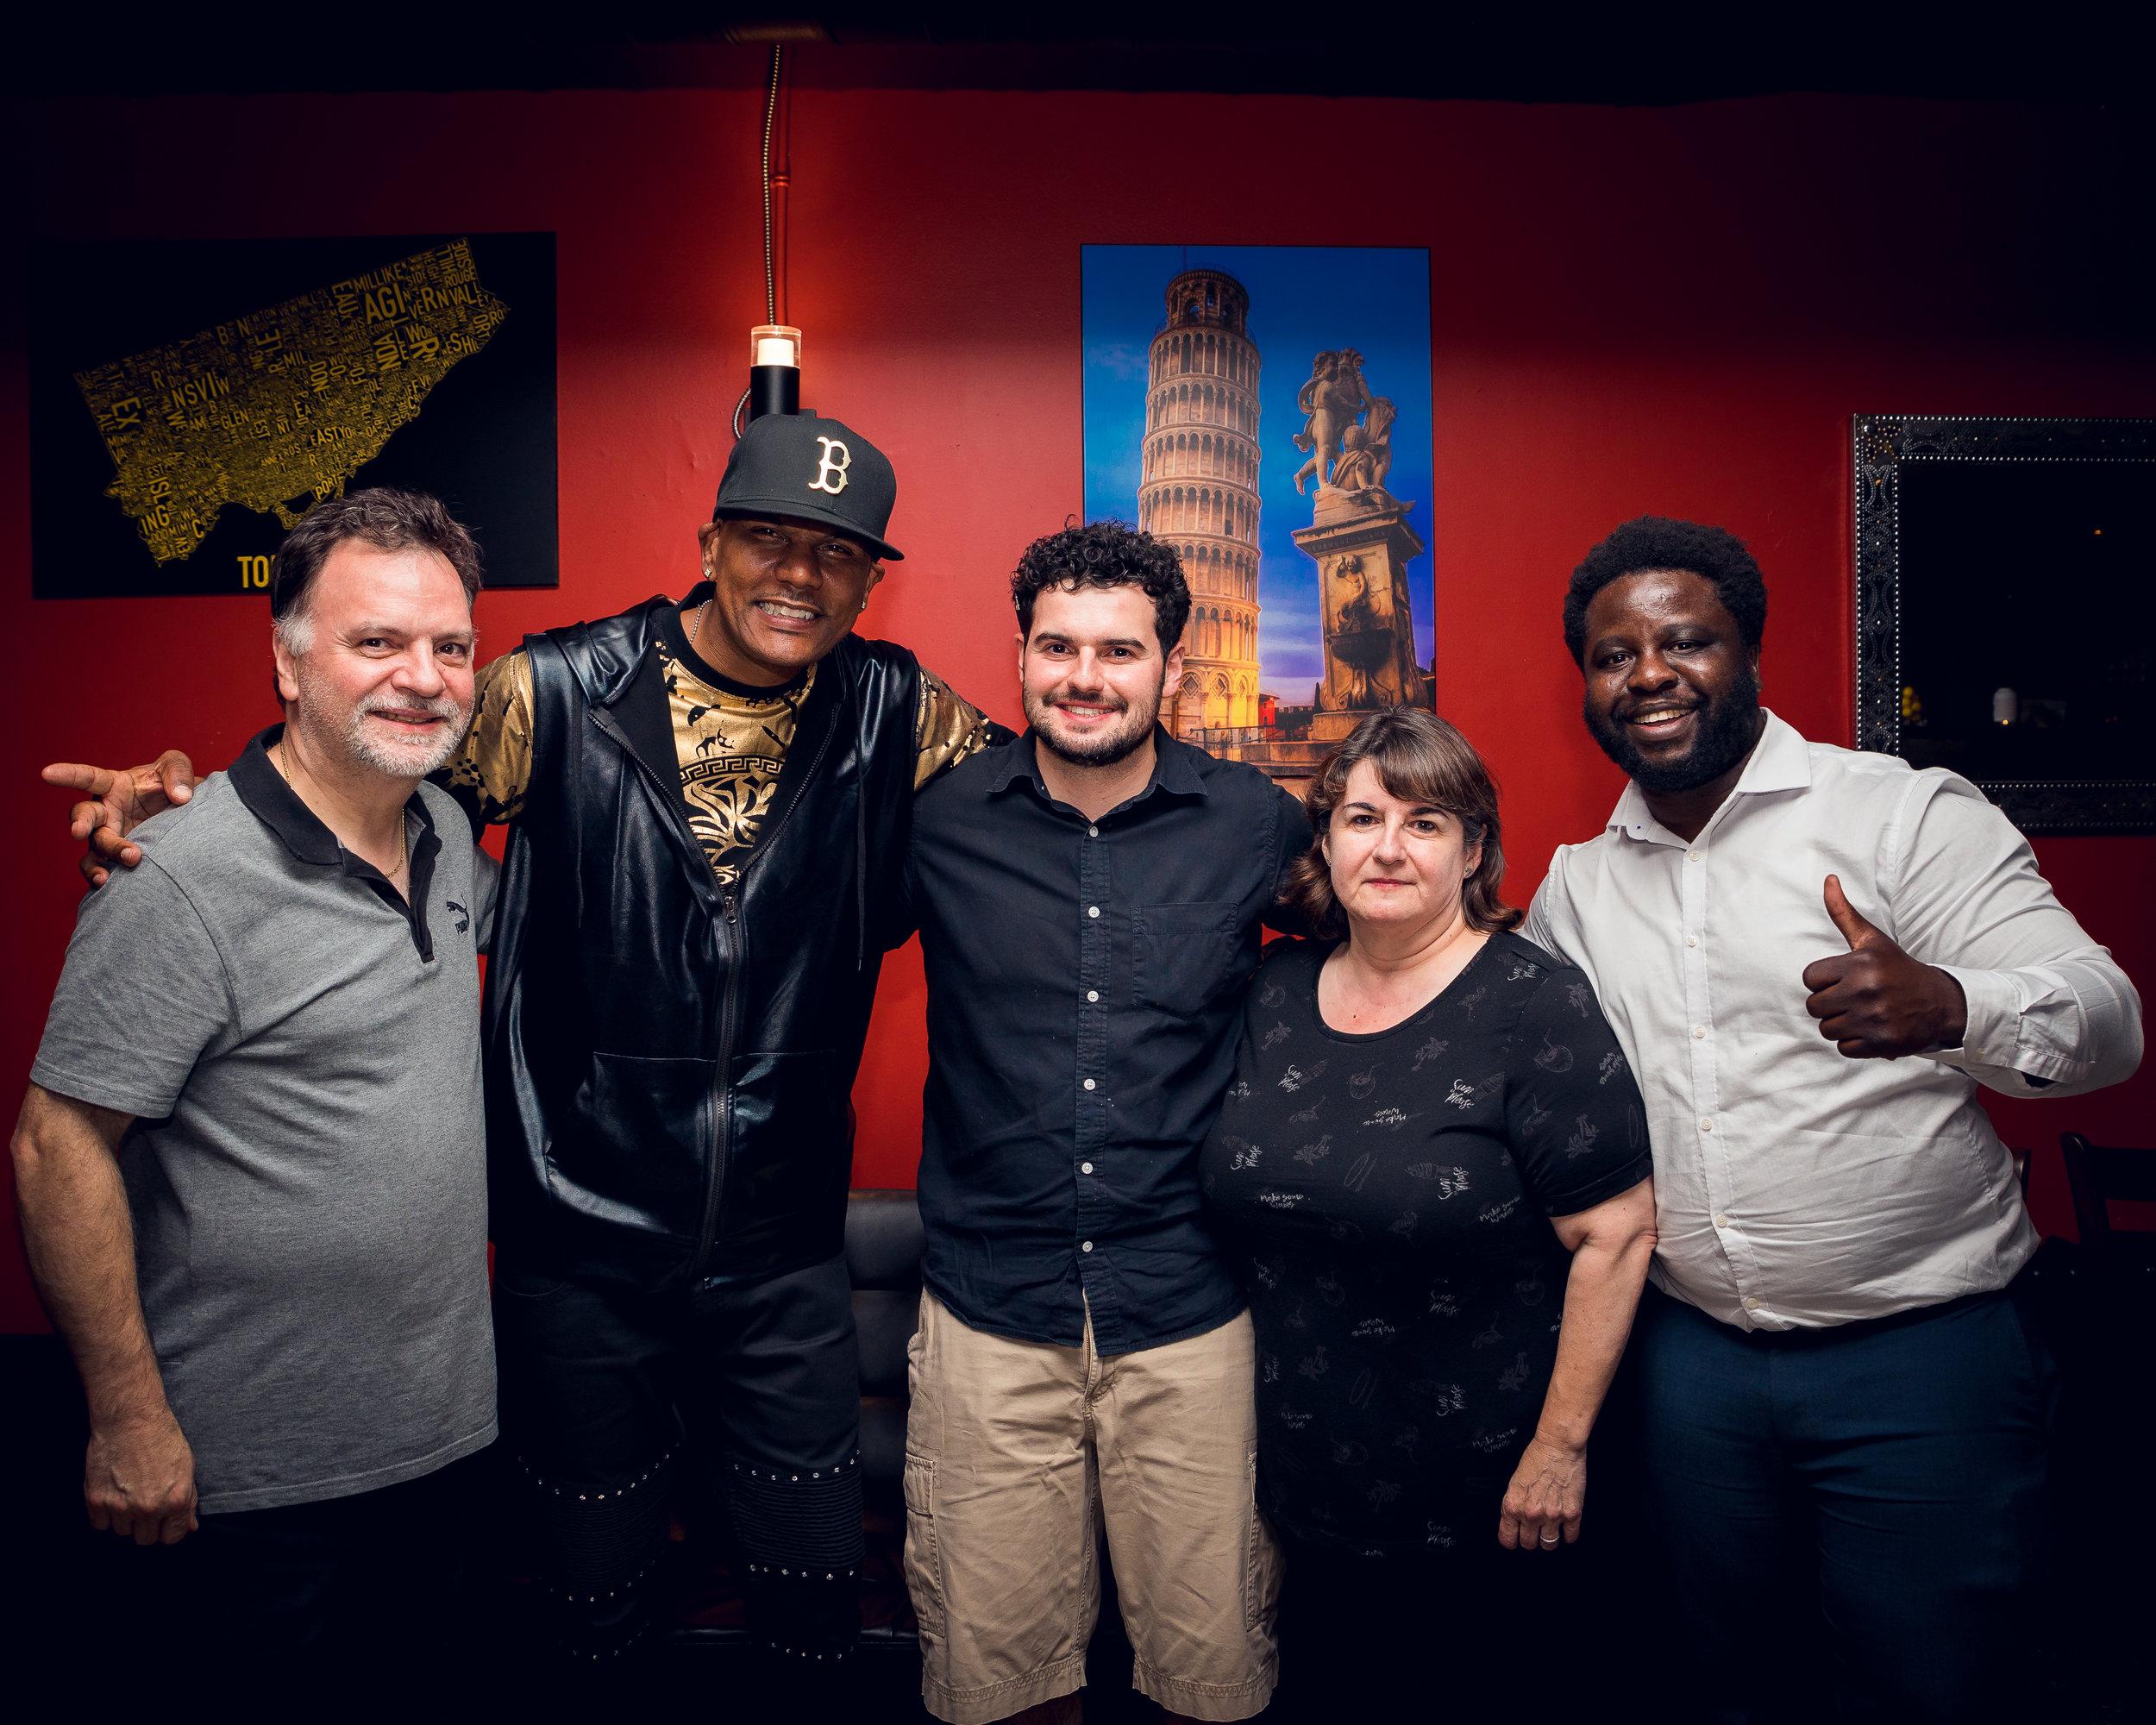 Scottie G of The Funky Bunch Live @ Salto Restaurant - Proofs-115.jpg